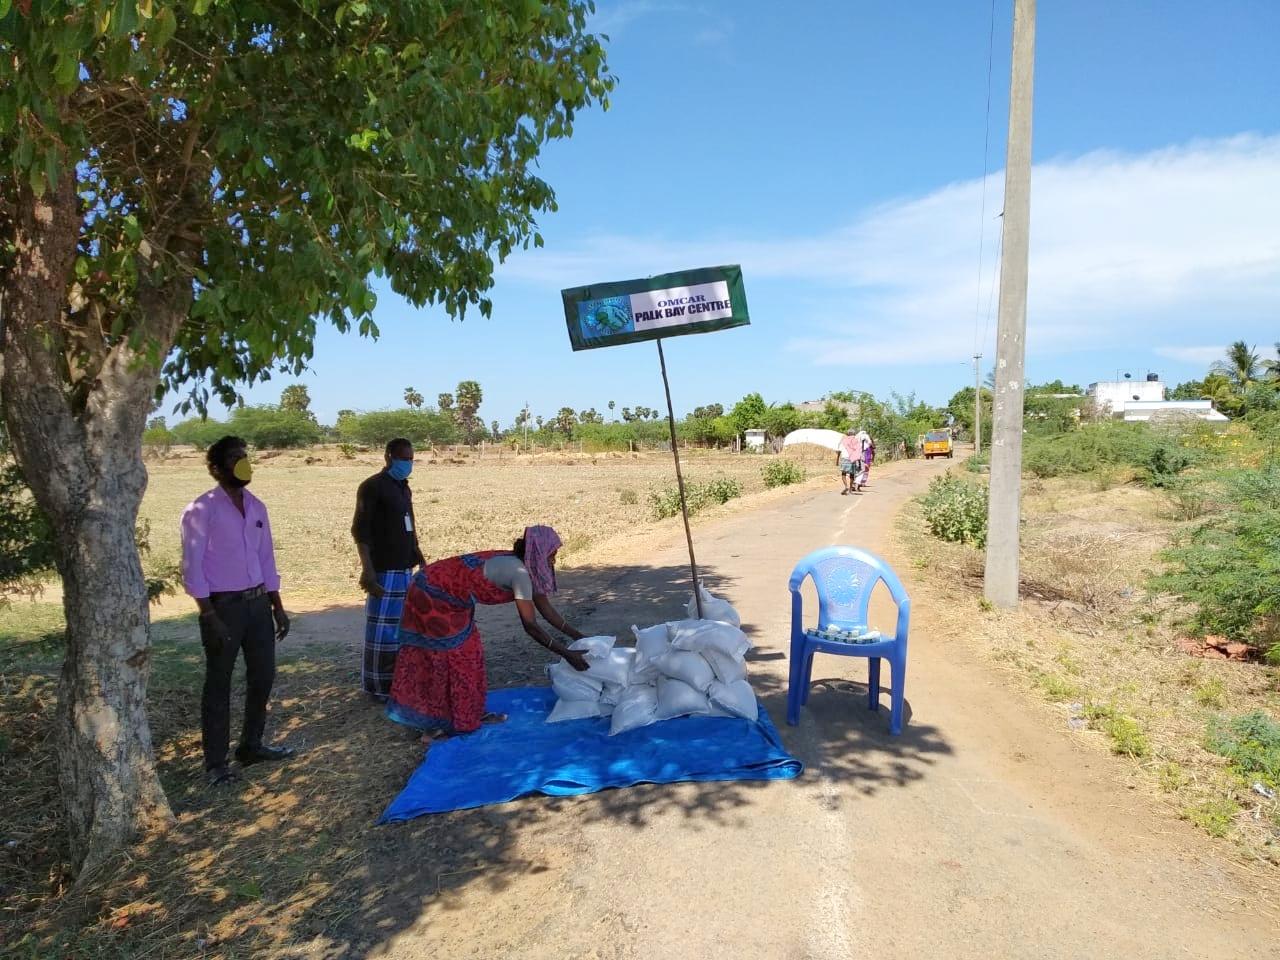 OMCAR_rice_donation_9_May_2020_6